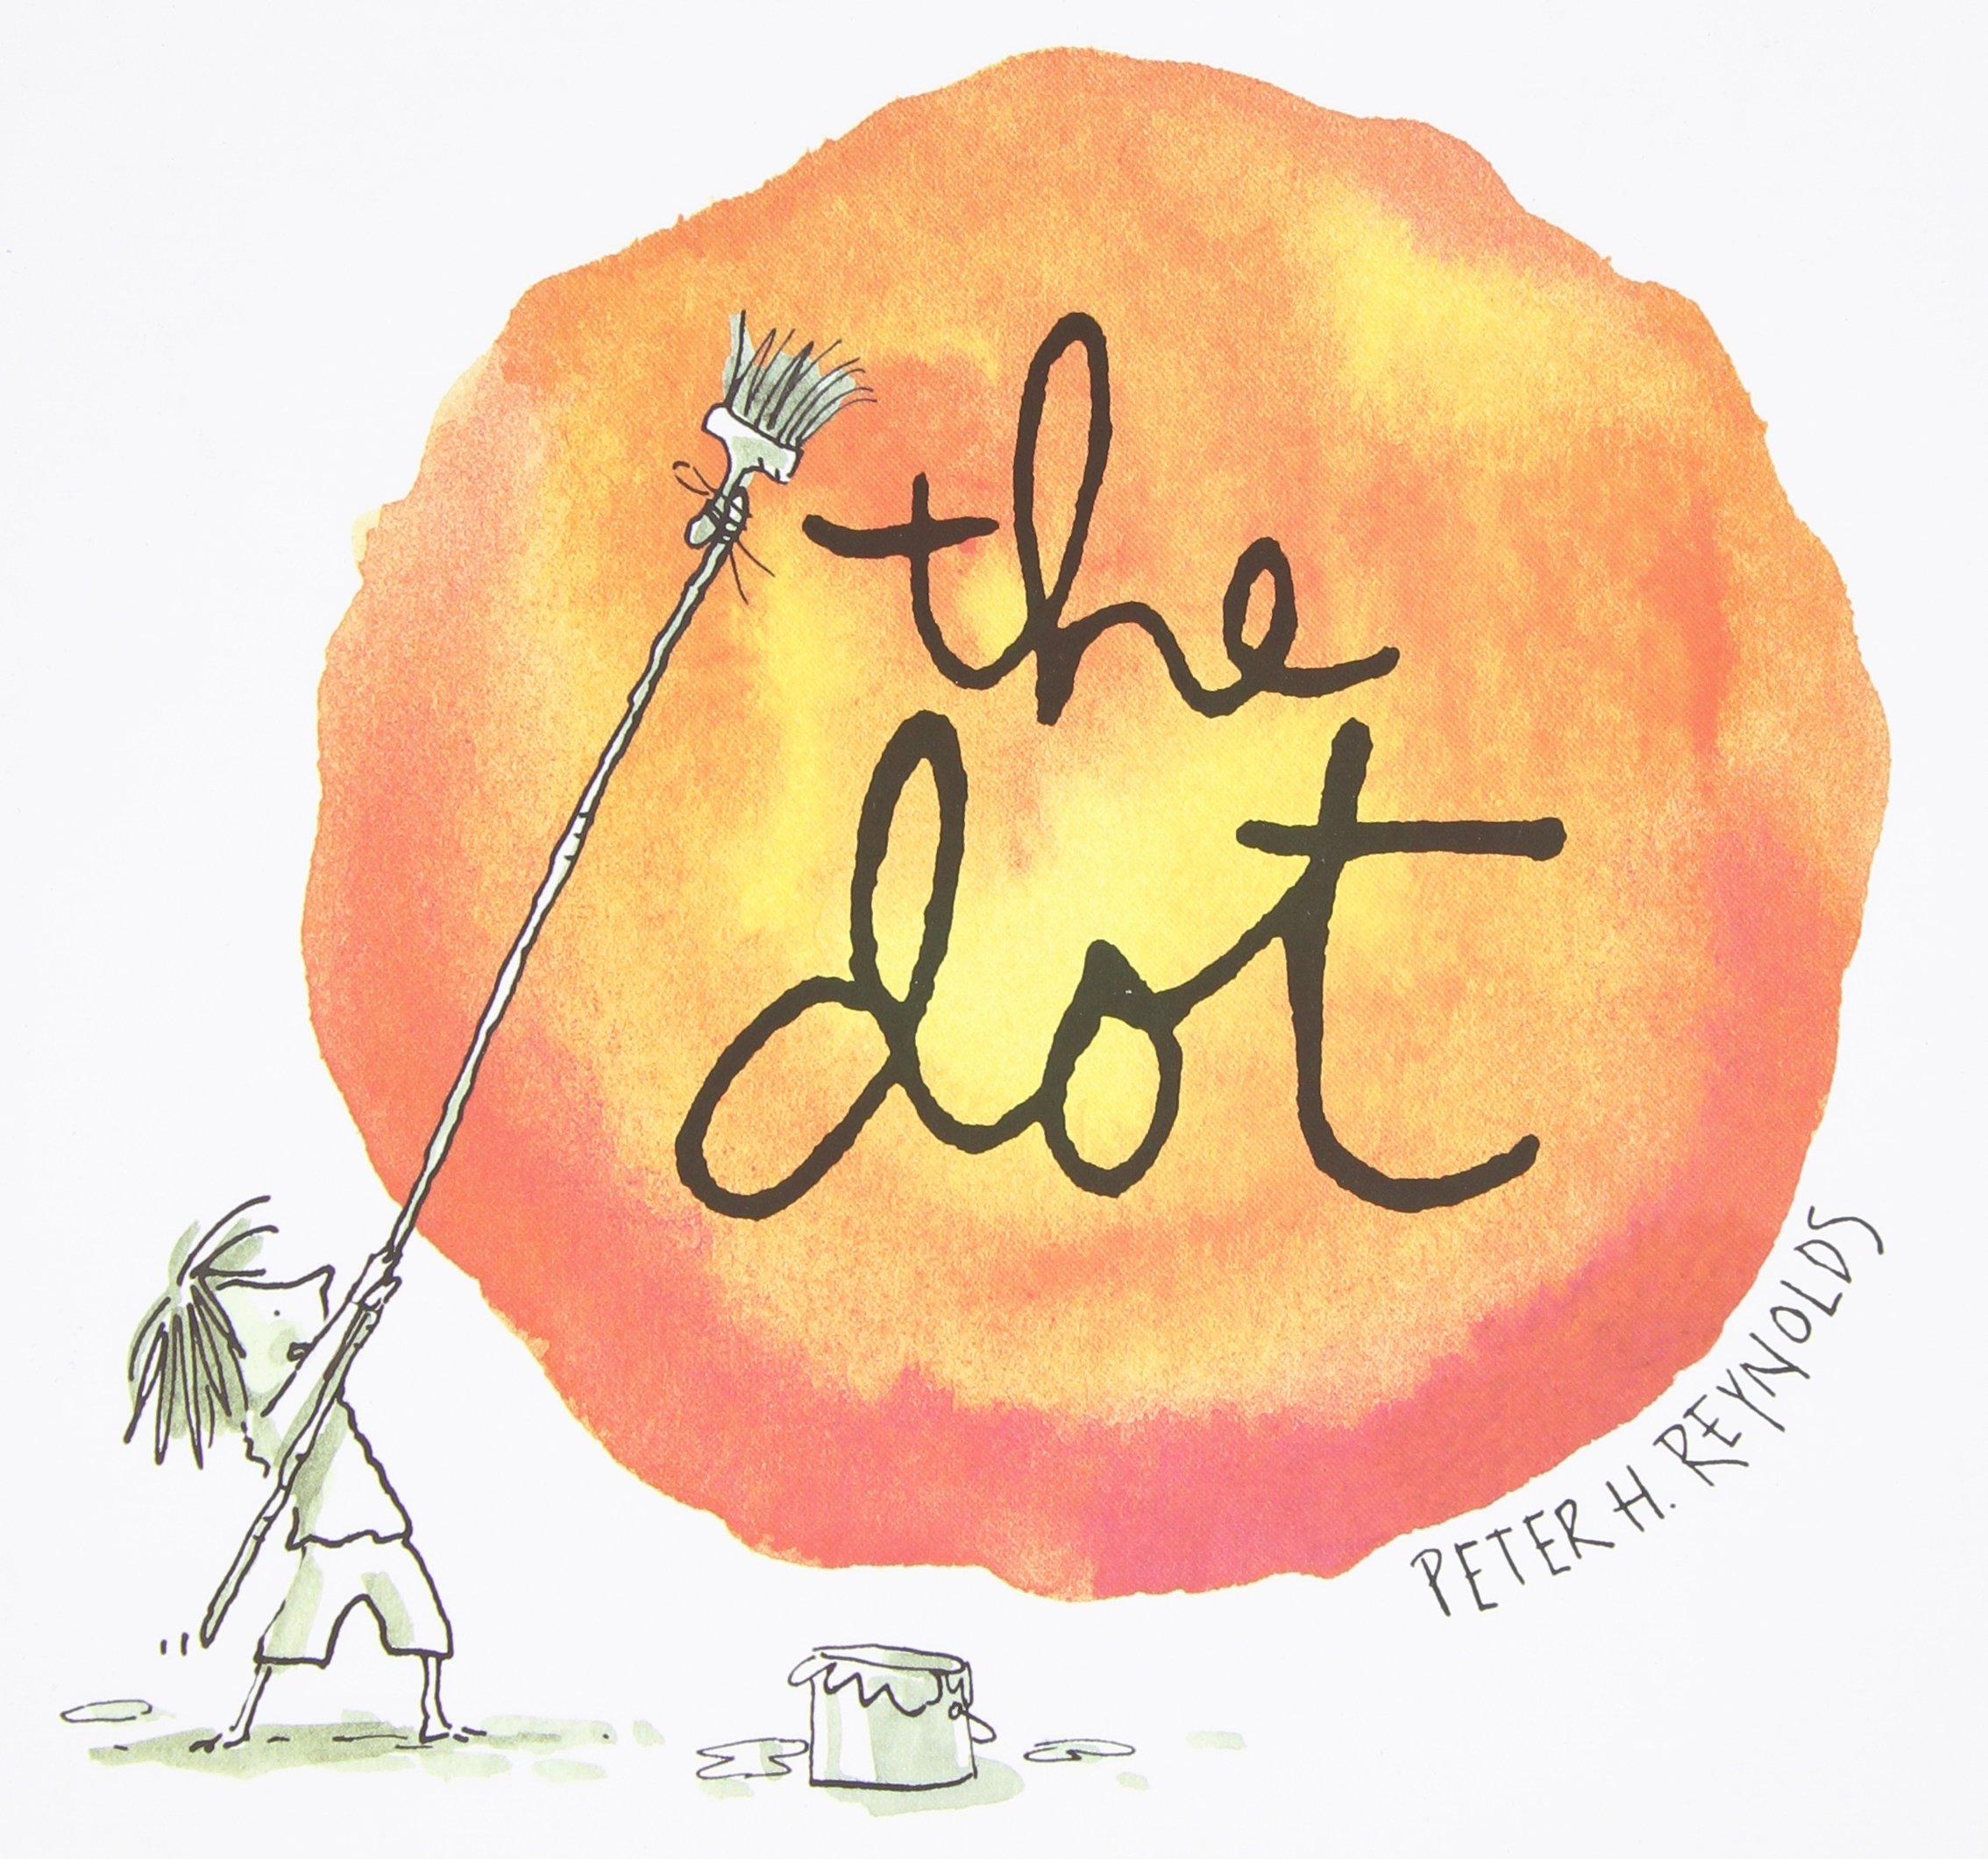 The Dot ISBN-13 9780763619619